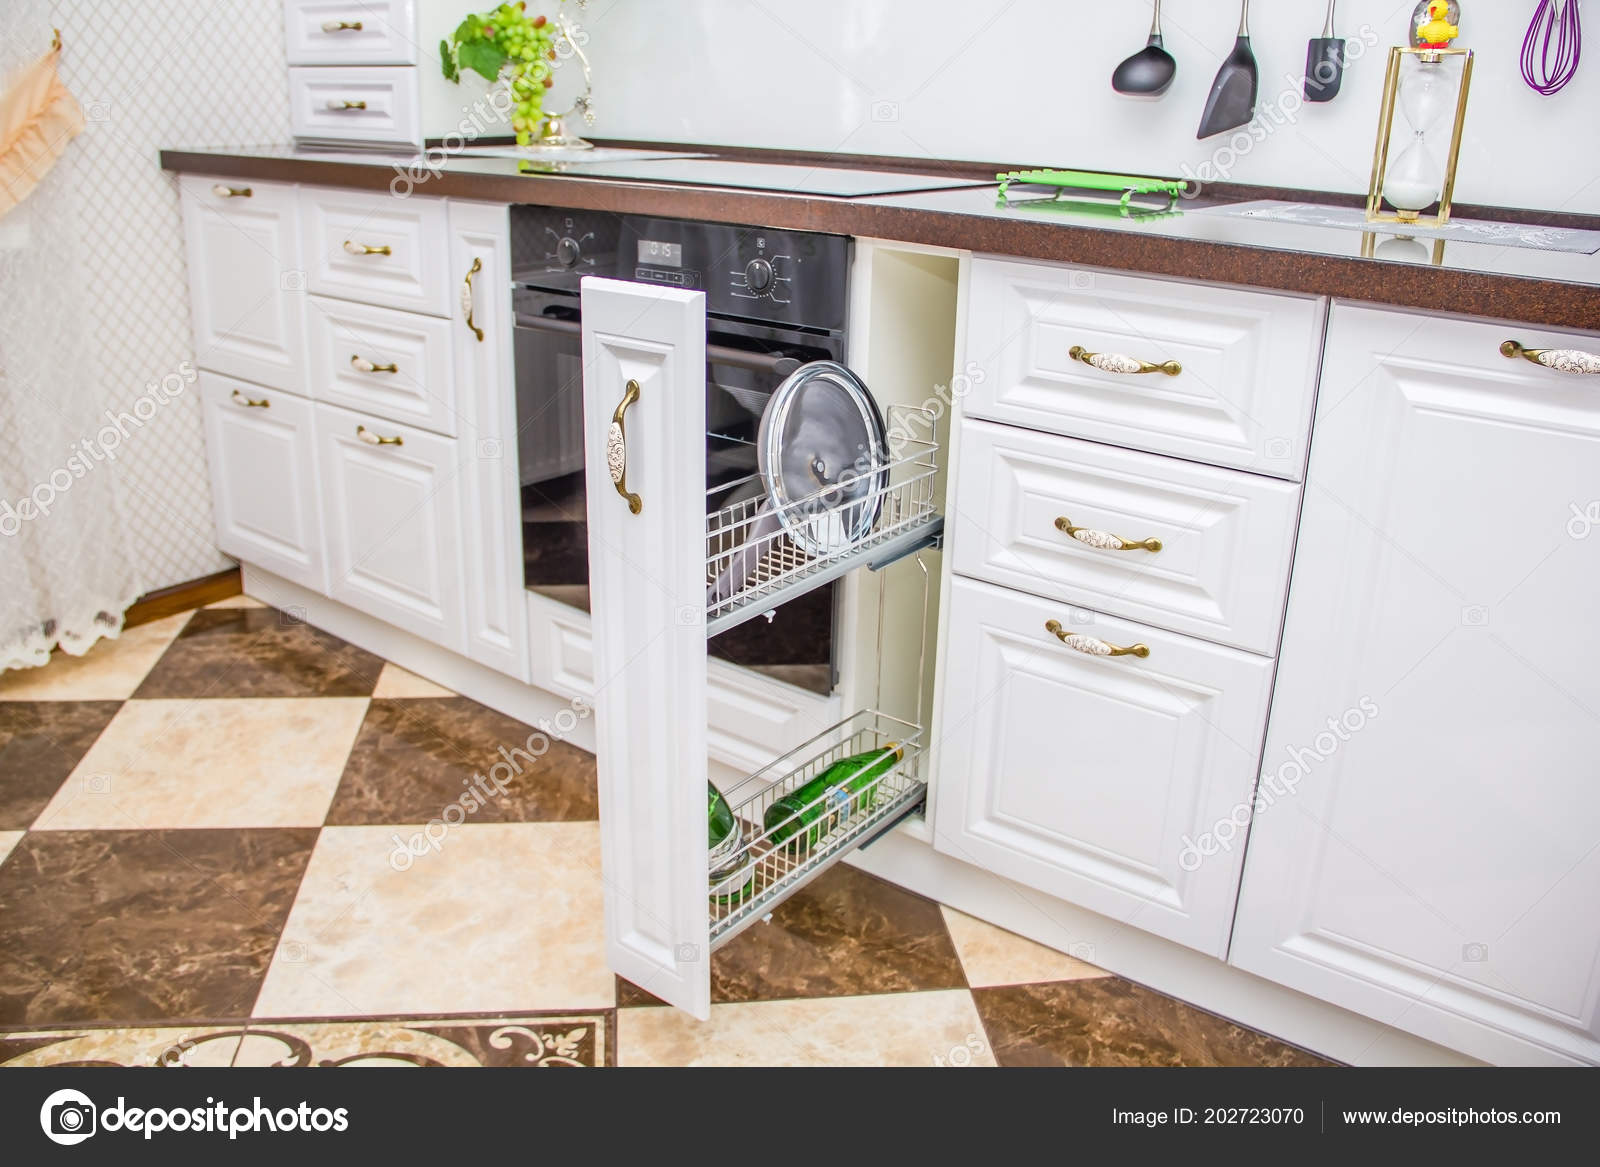 Ripiano Cucina Muratura Bianca Vino — Foto Stock ...